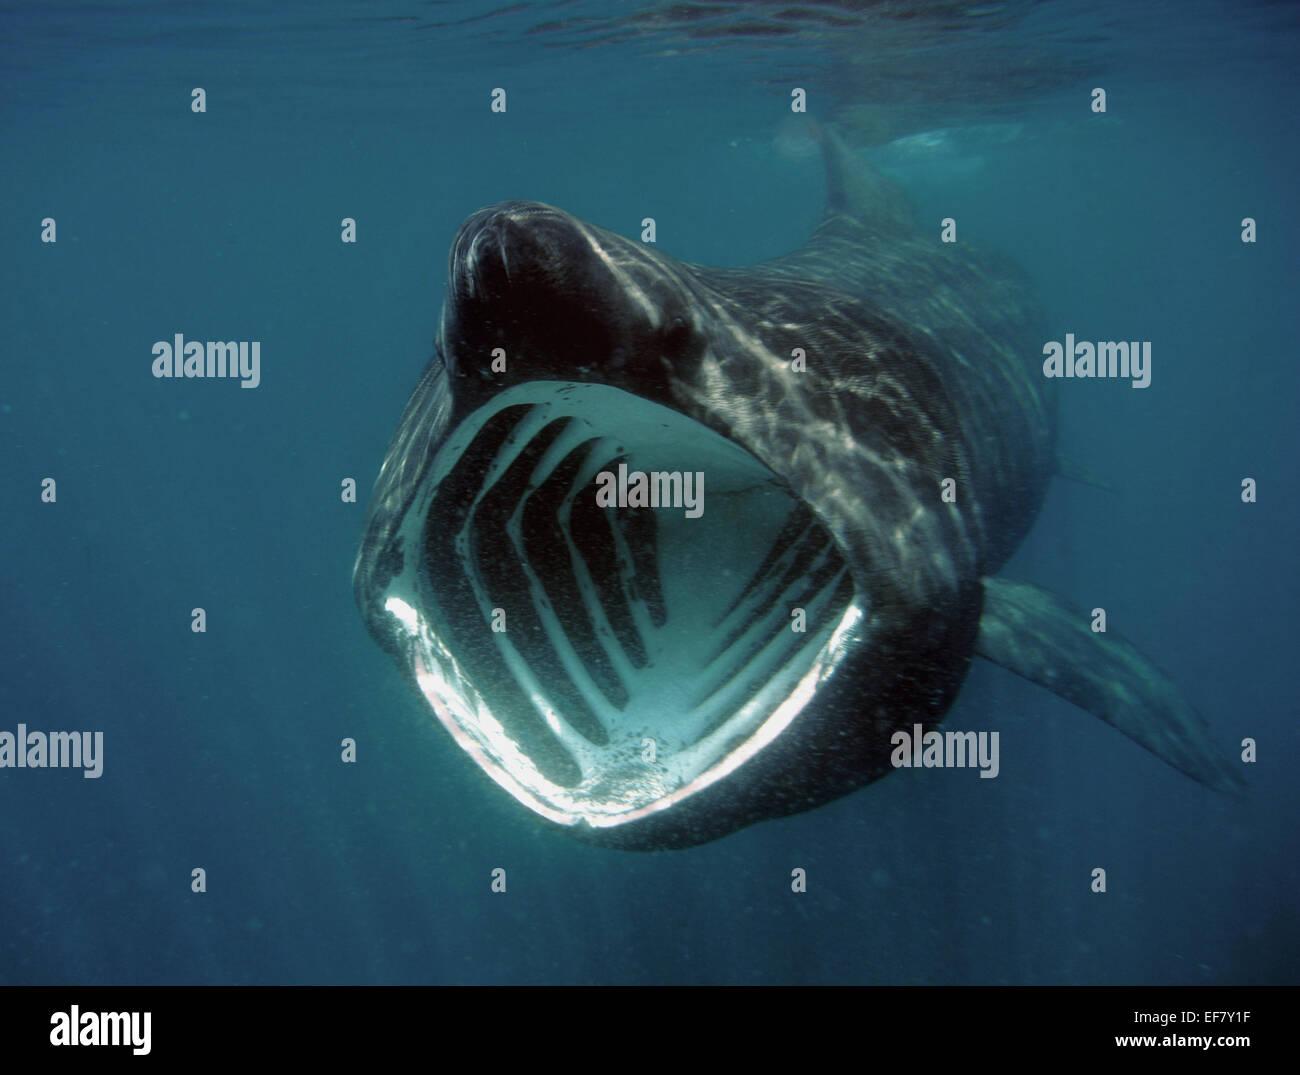 Basking Shark feeding on plankton in Sennen Cove, Cornwall - Stock Image